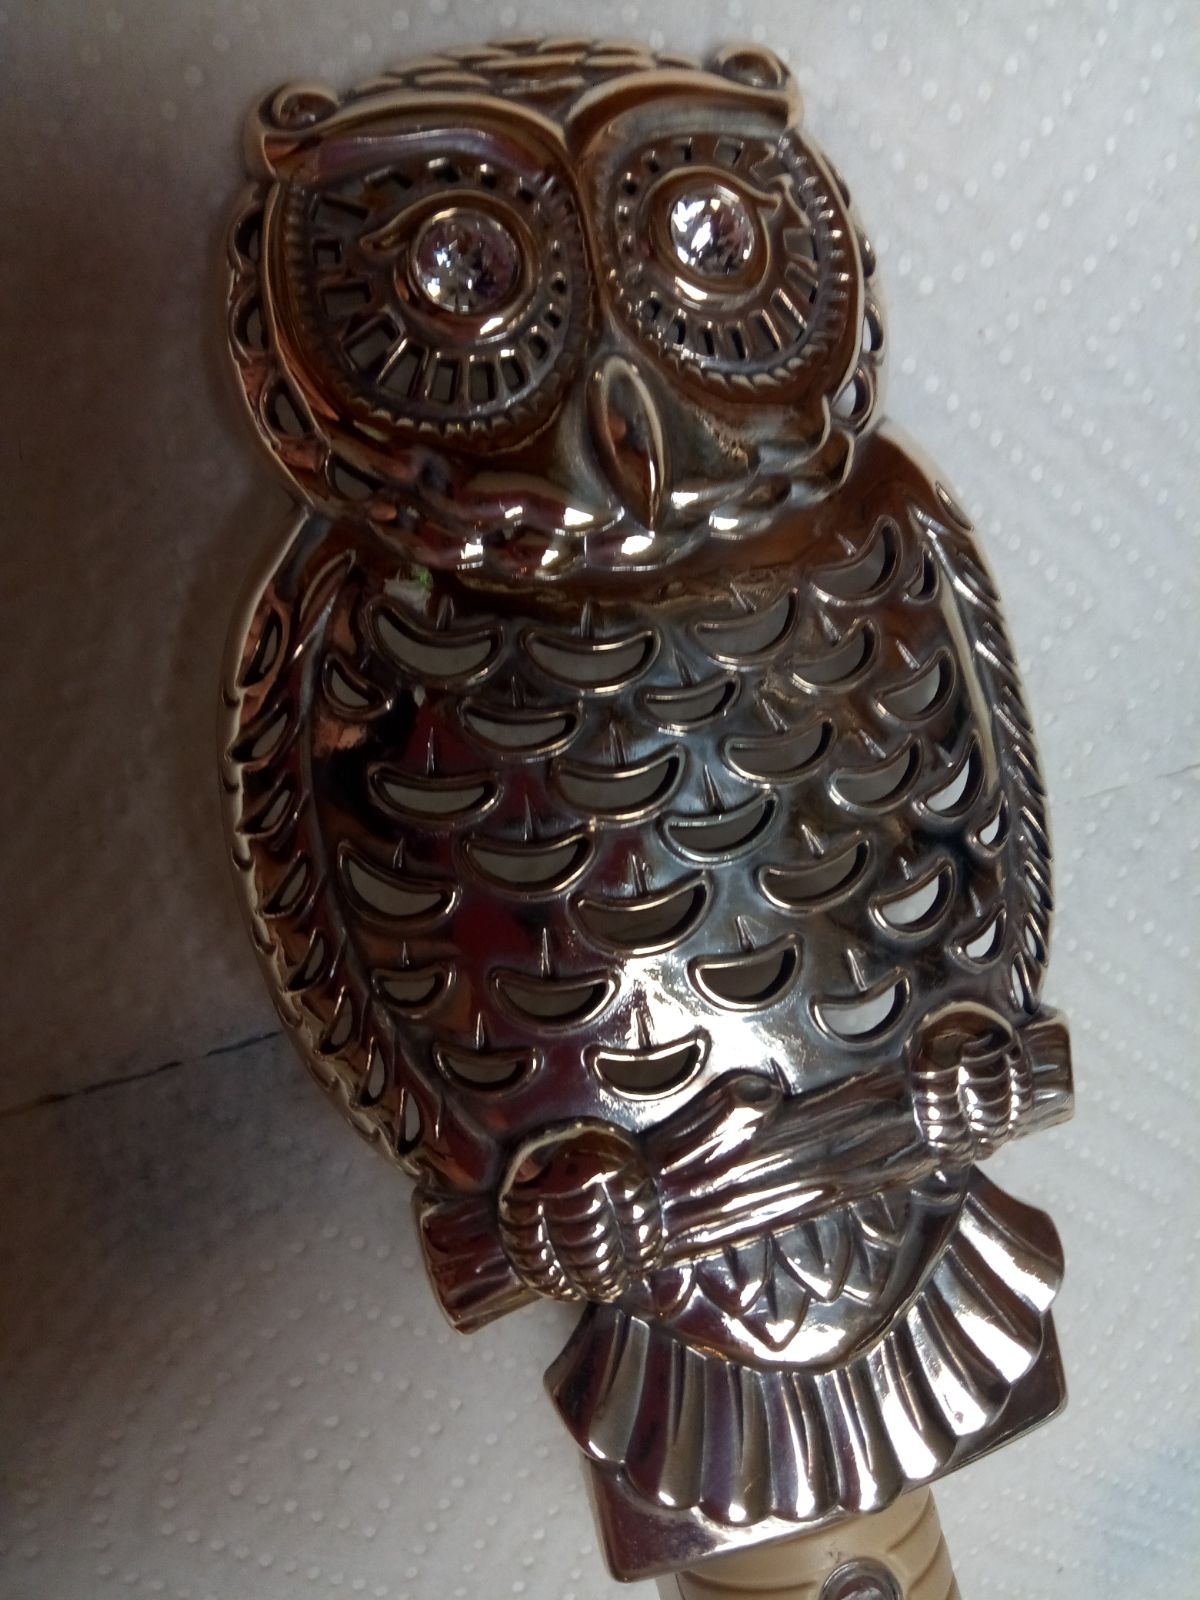 Brighton Owl Night Light Plug-in *USED*